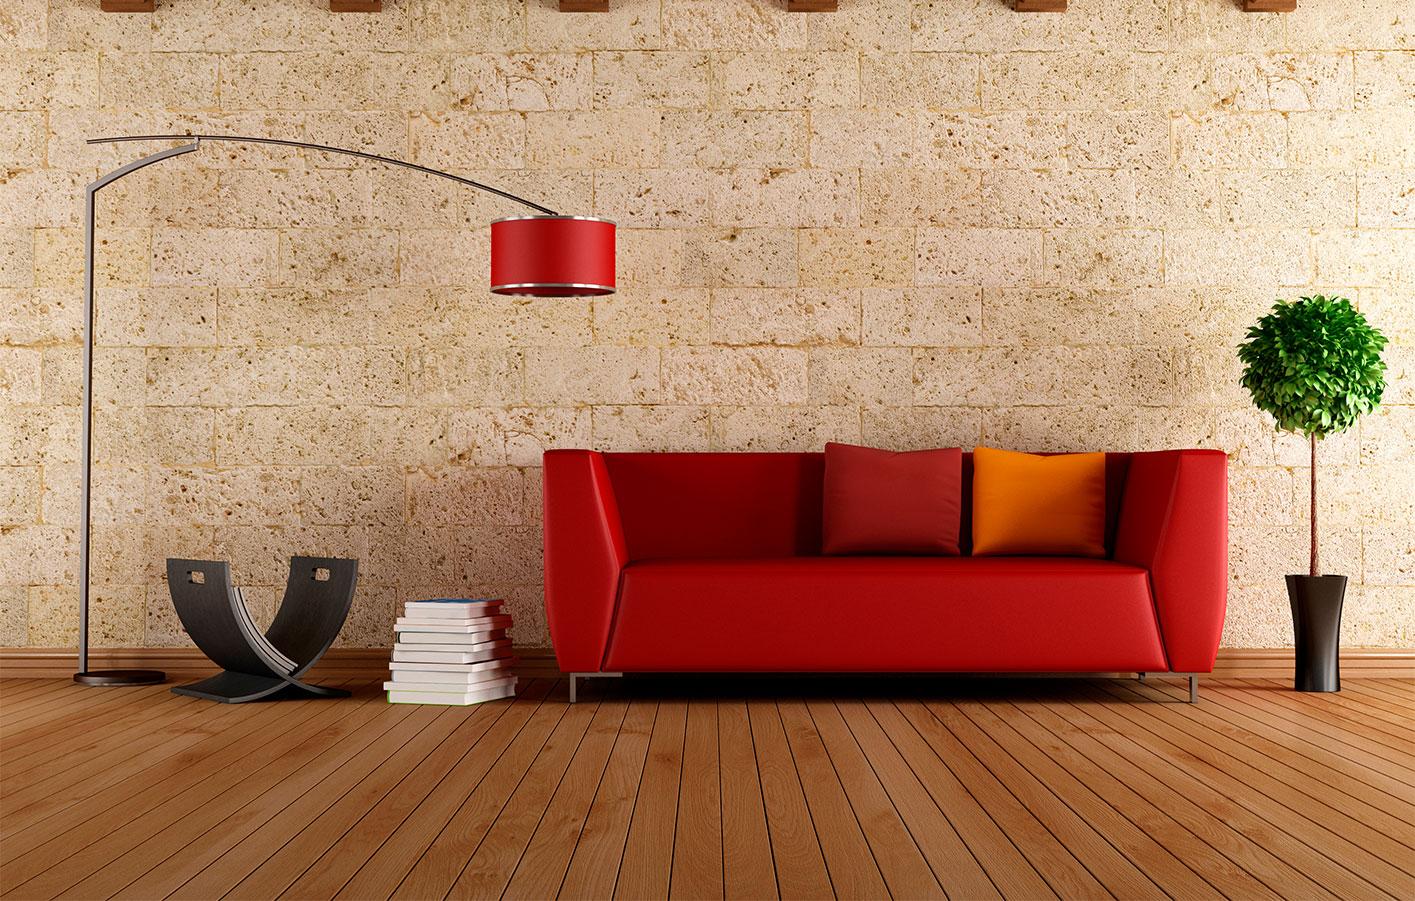 laminat boden paneele terrassen garten he dorf lohr karlstadt schweinfurt spessart boden. Black Bedroom Furniture Sets. Home Design Ideas